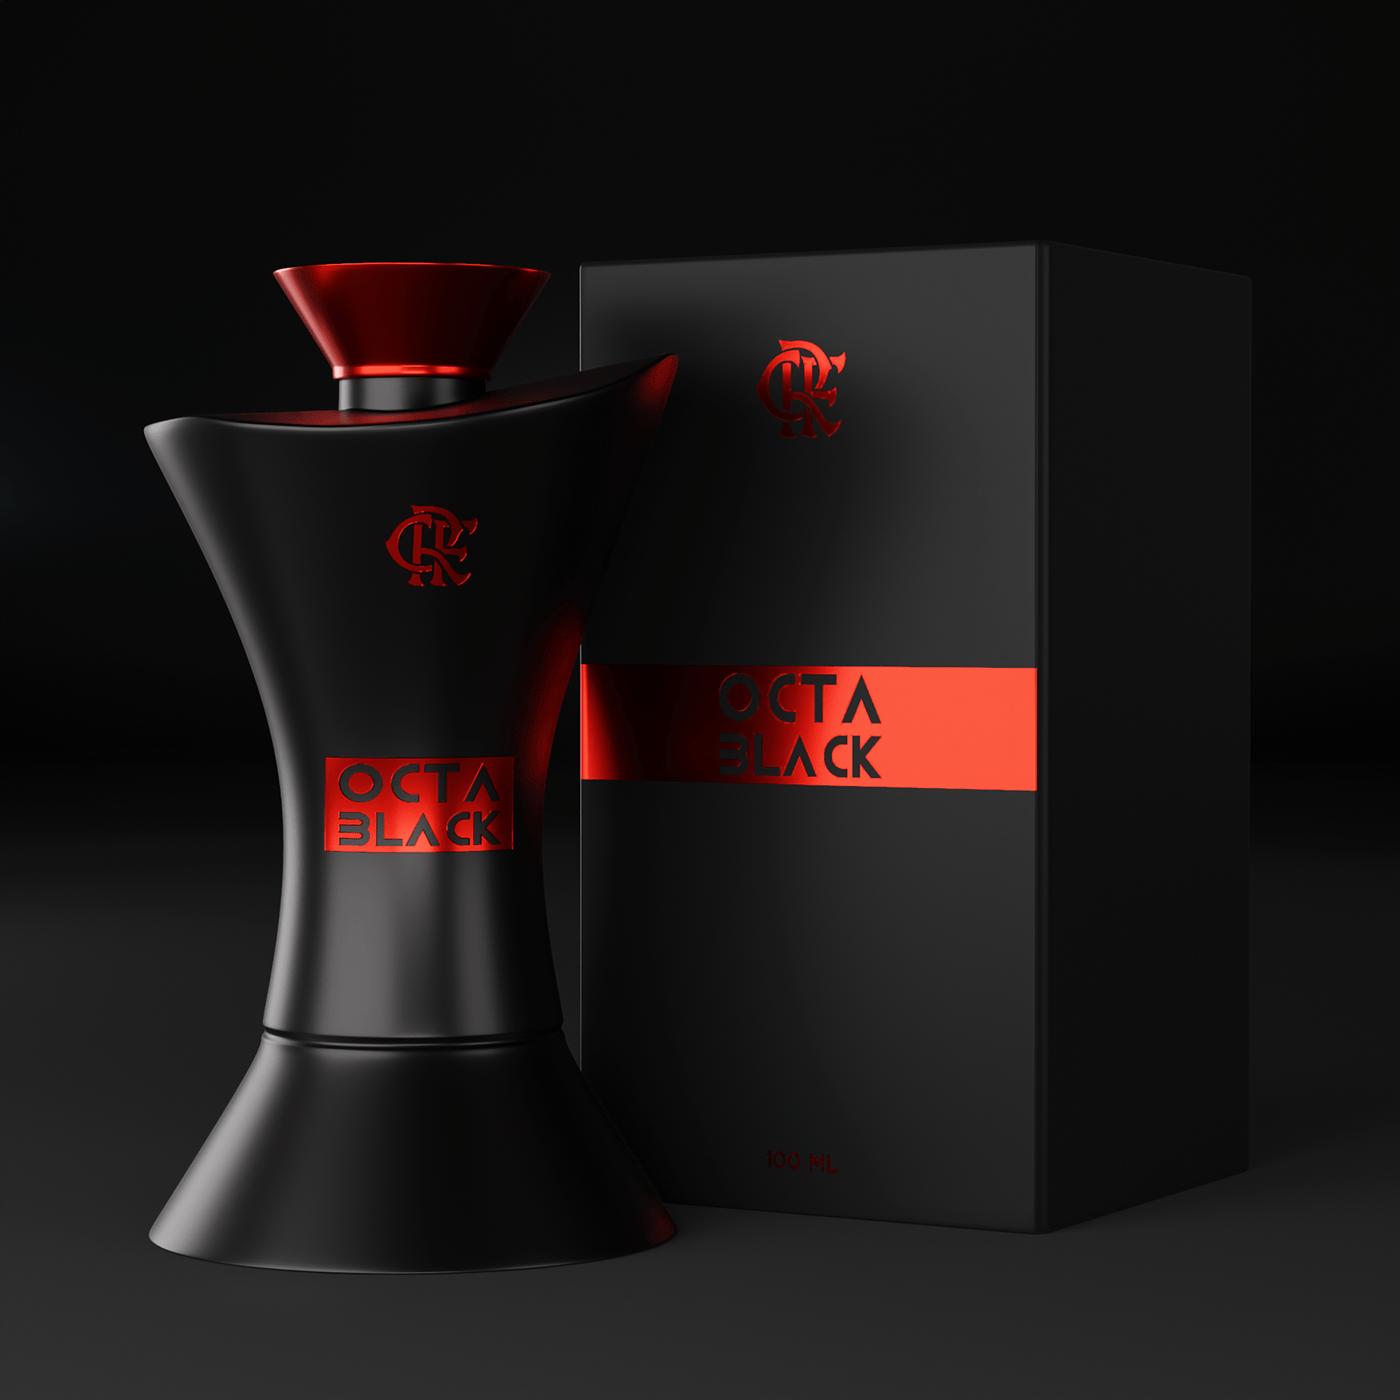 3D,blender,design de produto,design gráfico,embalagem,flamengo,luxcore,Packshot,perfume